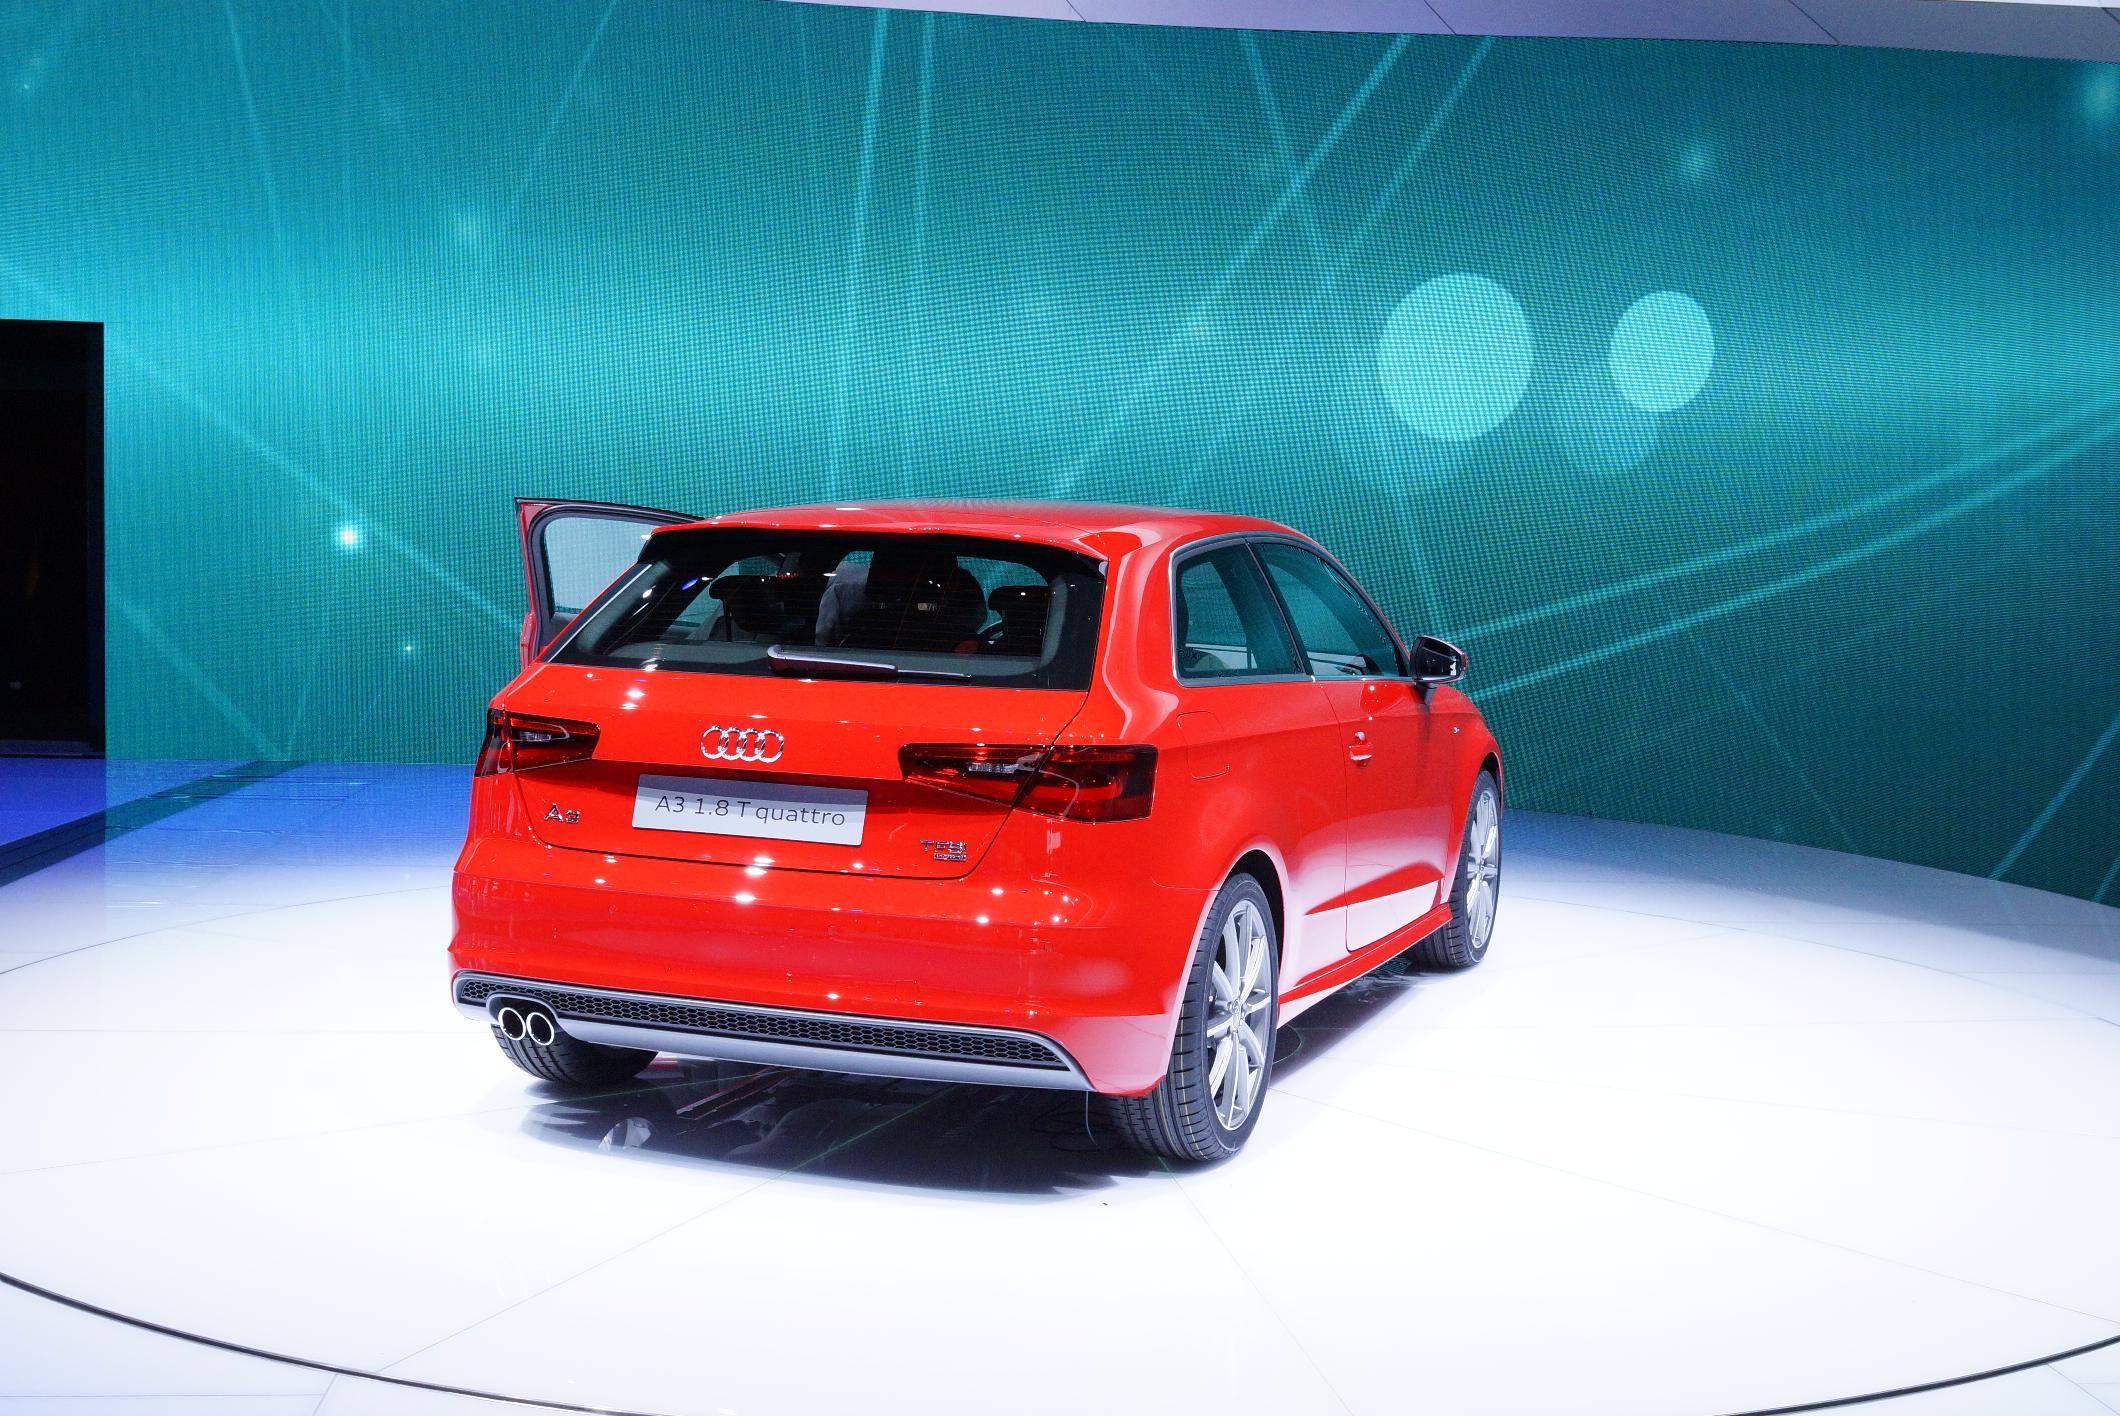 Audi A3 Geneva 2012 Rear